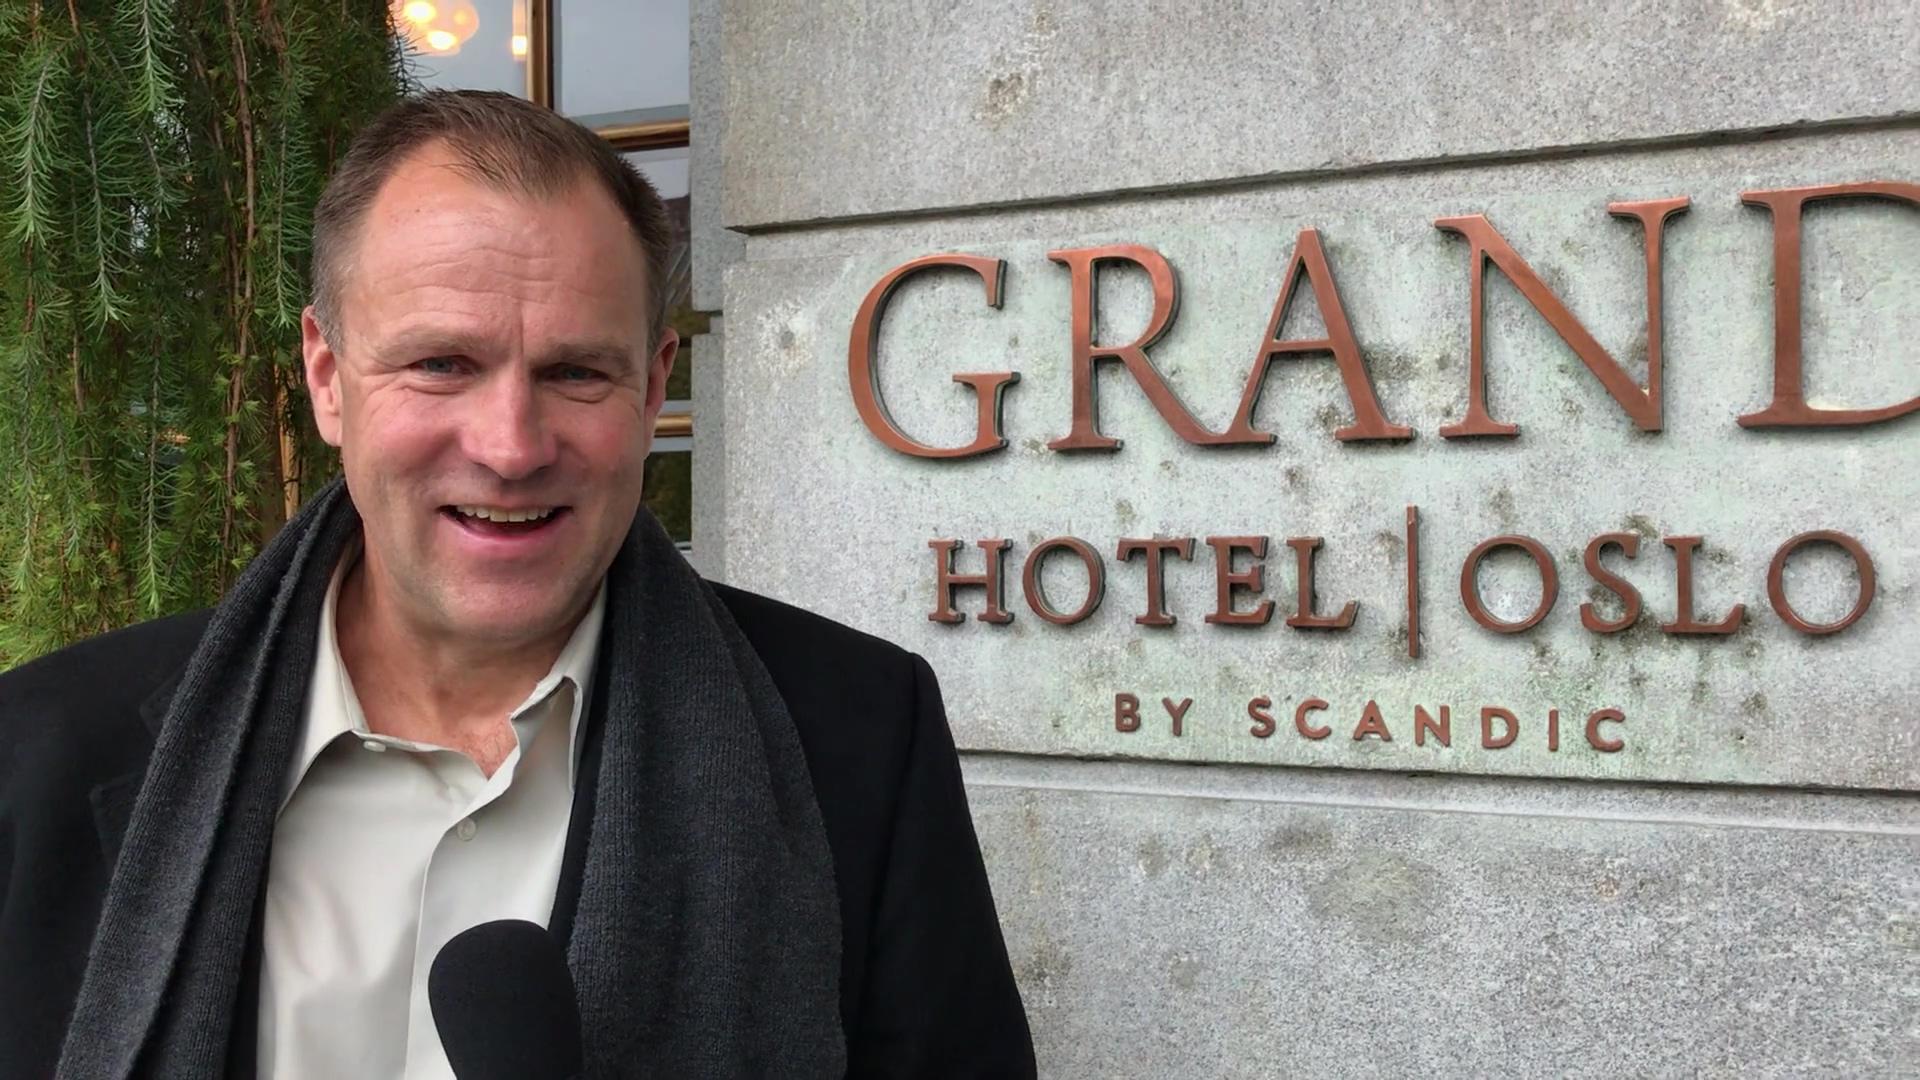 Vegard foran Grand Hotel-1